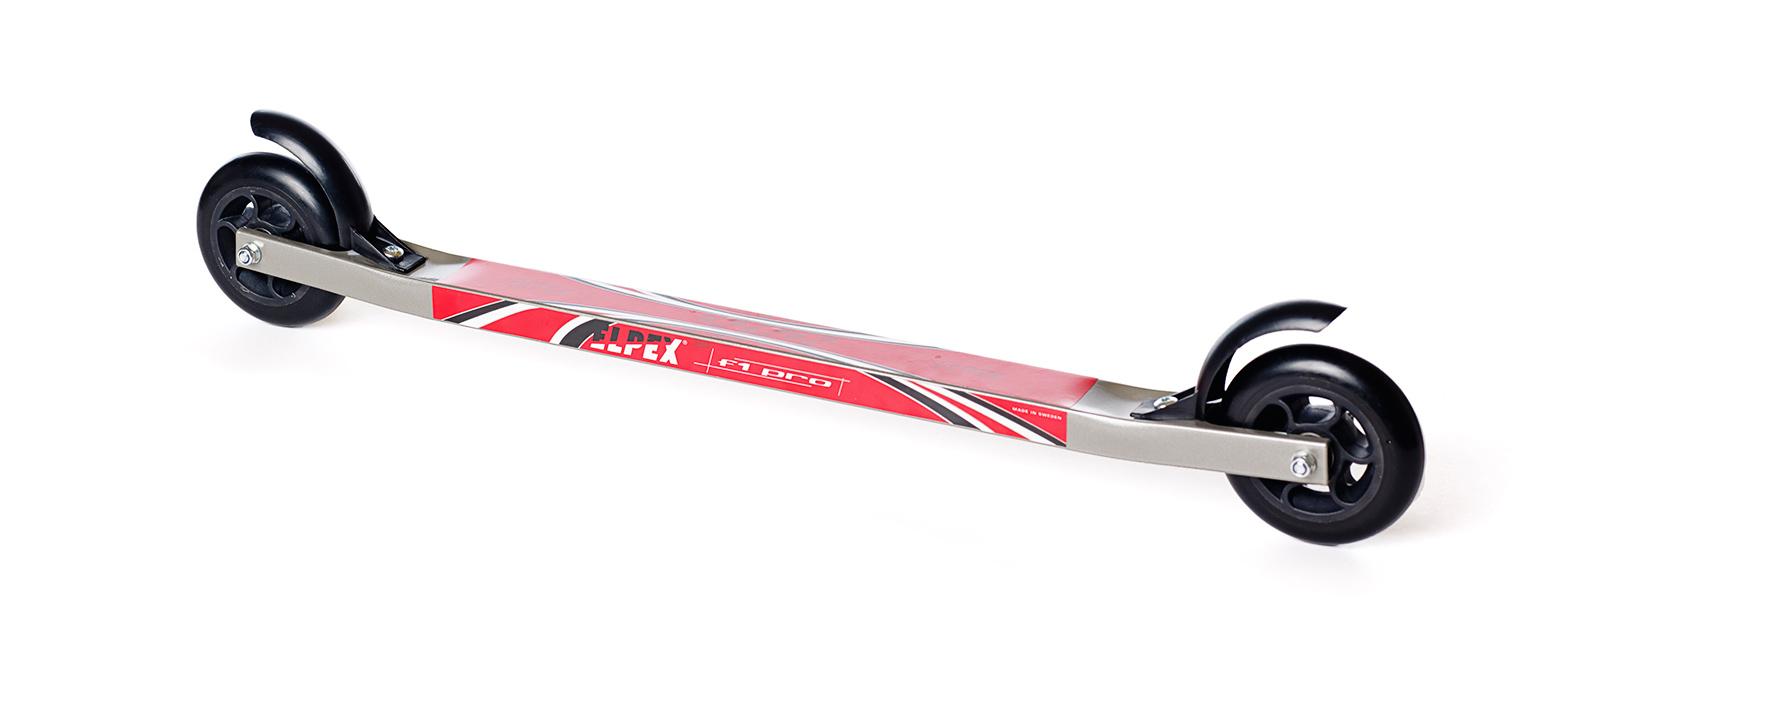 Elpex F1 Pro1 skate